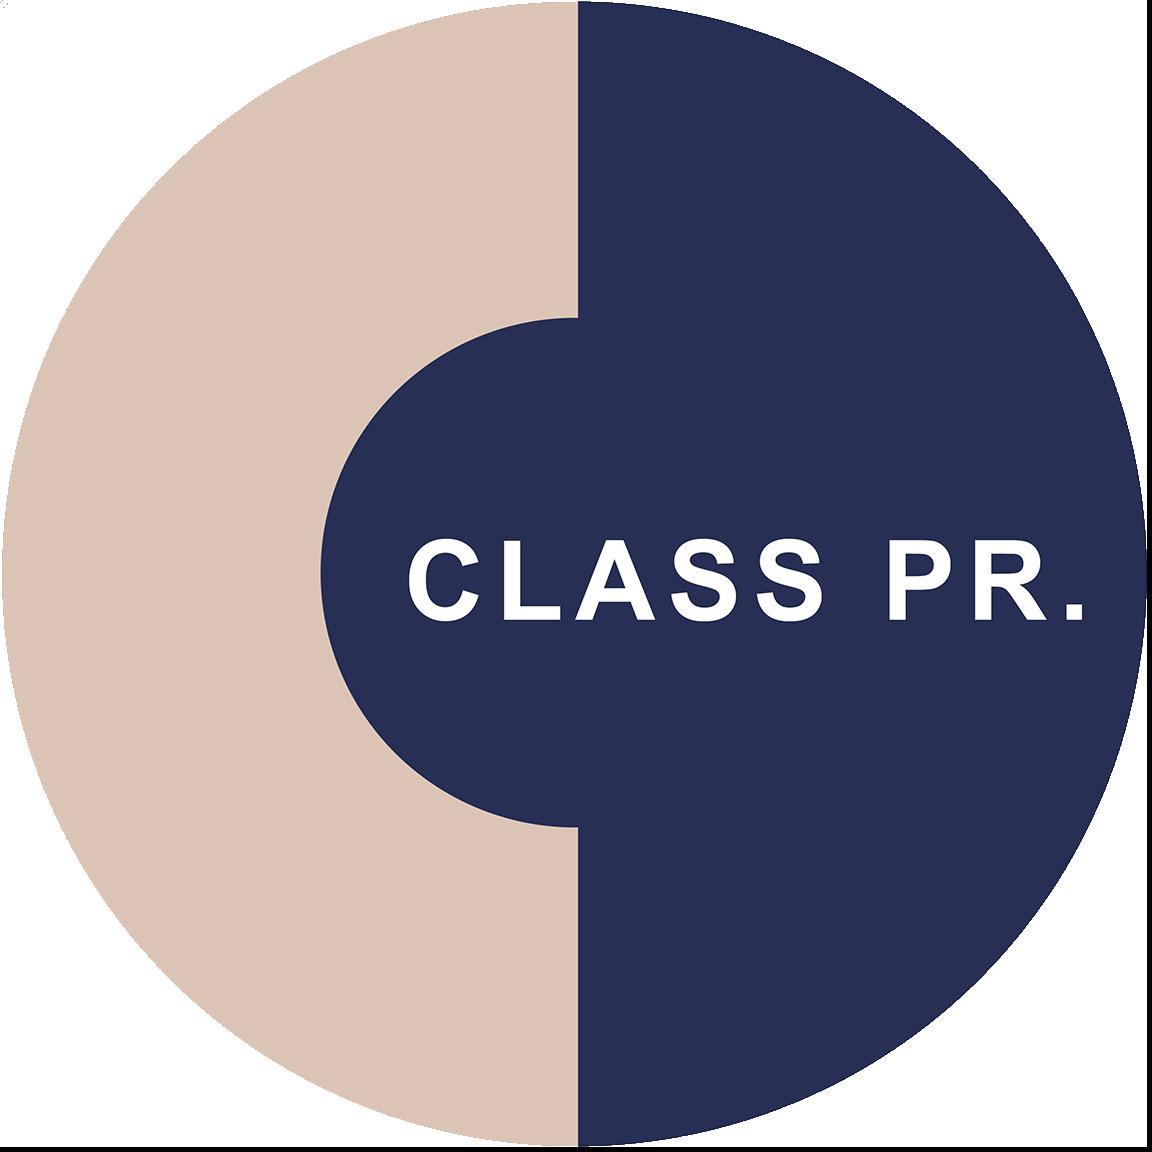 Class PR